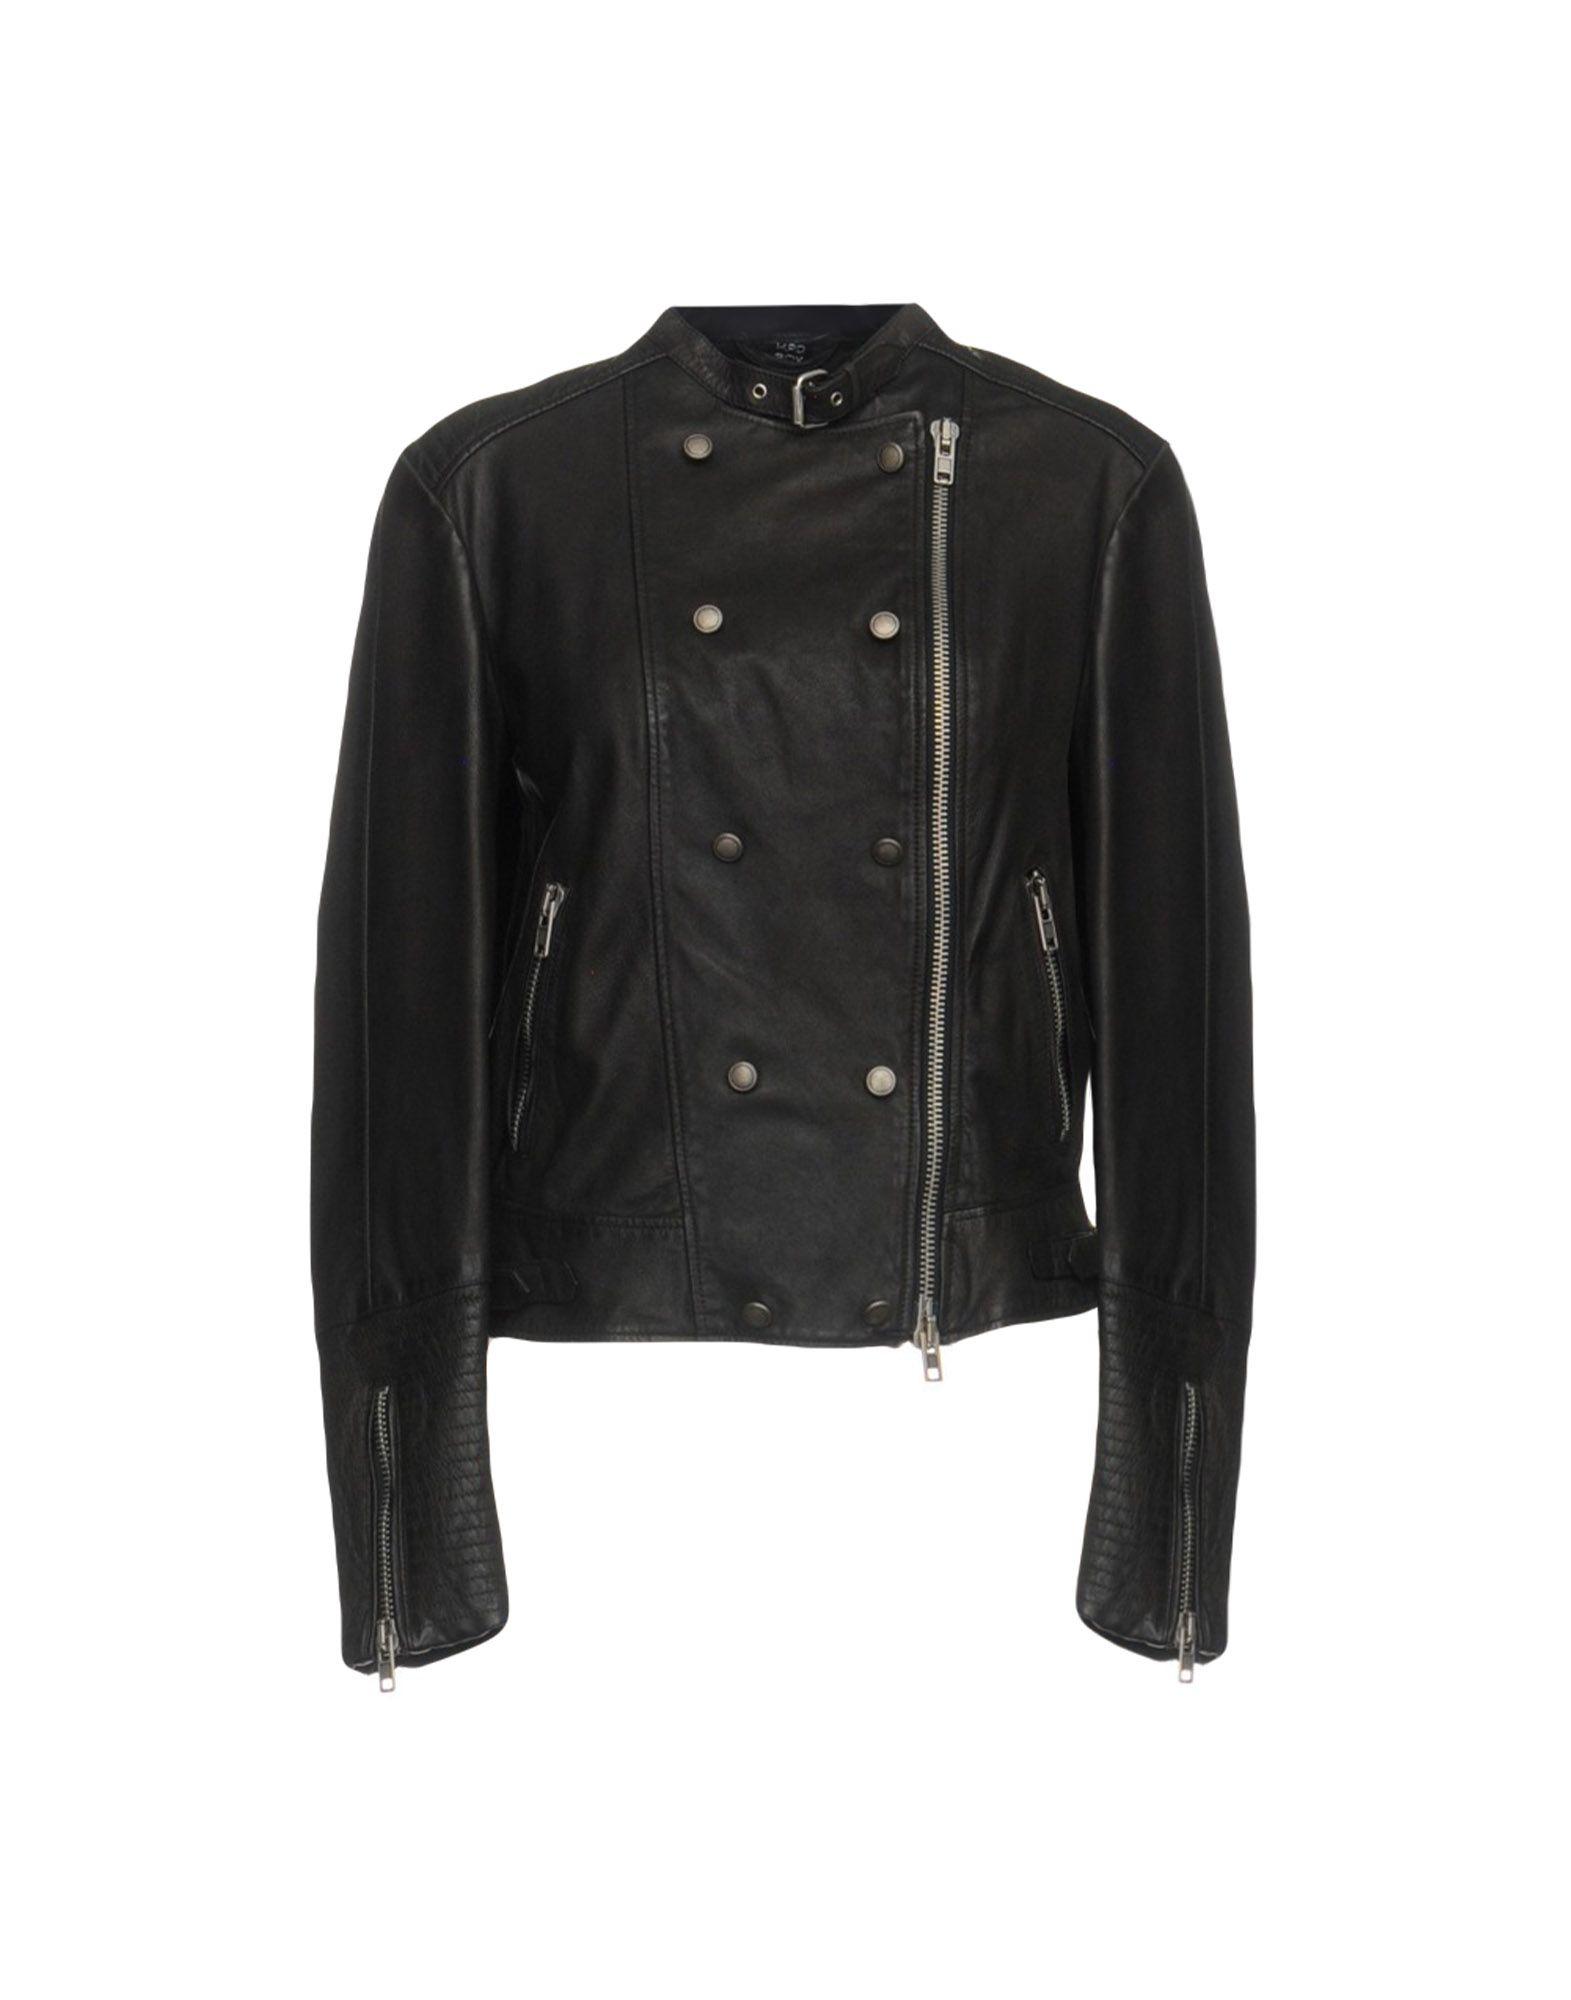 MPD BOX Biker Jacket in Dark Brown